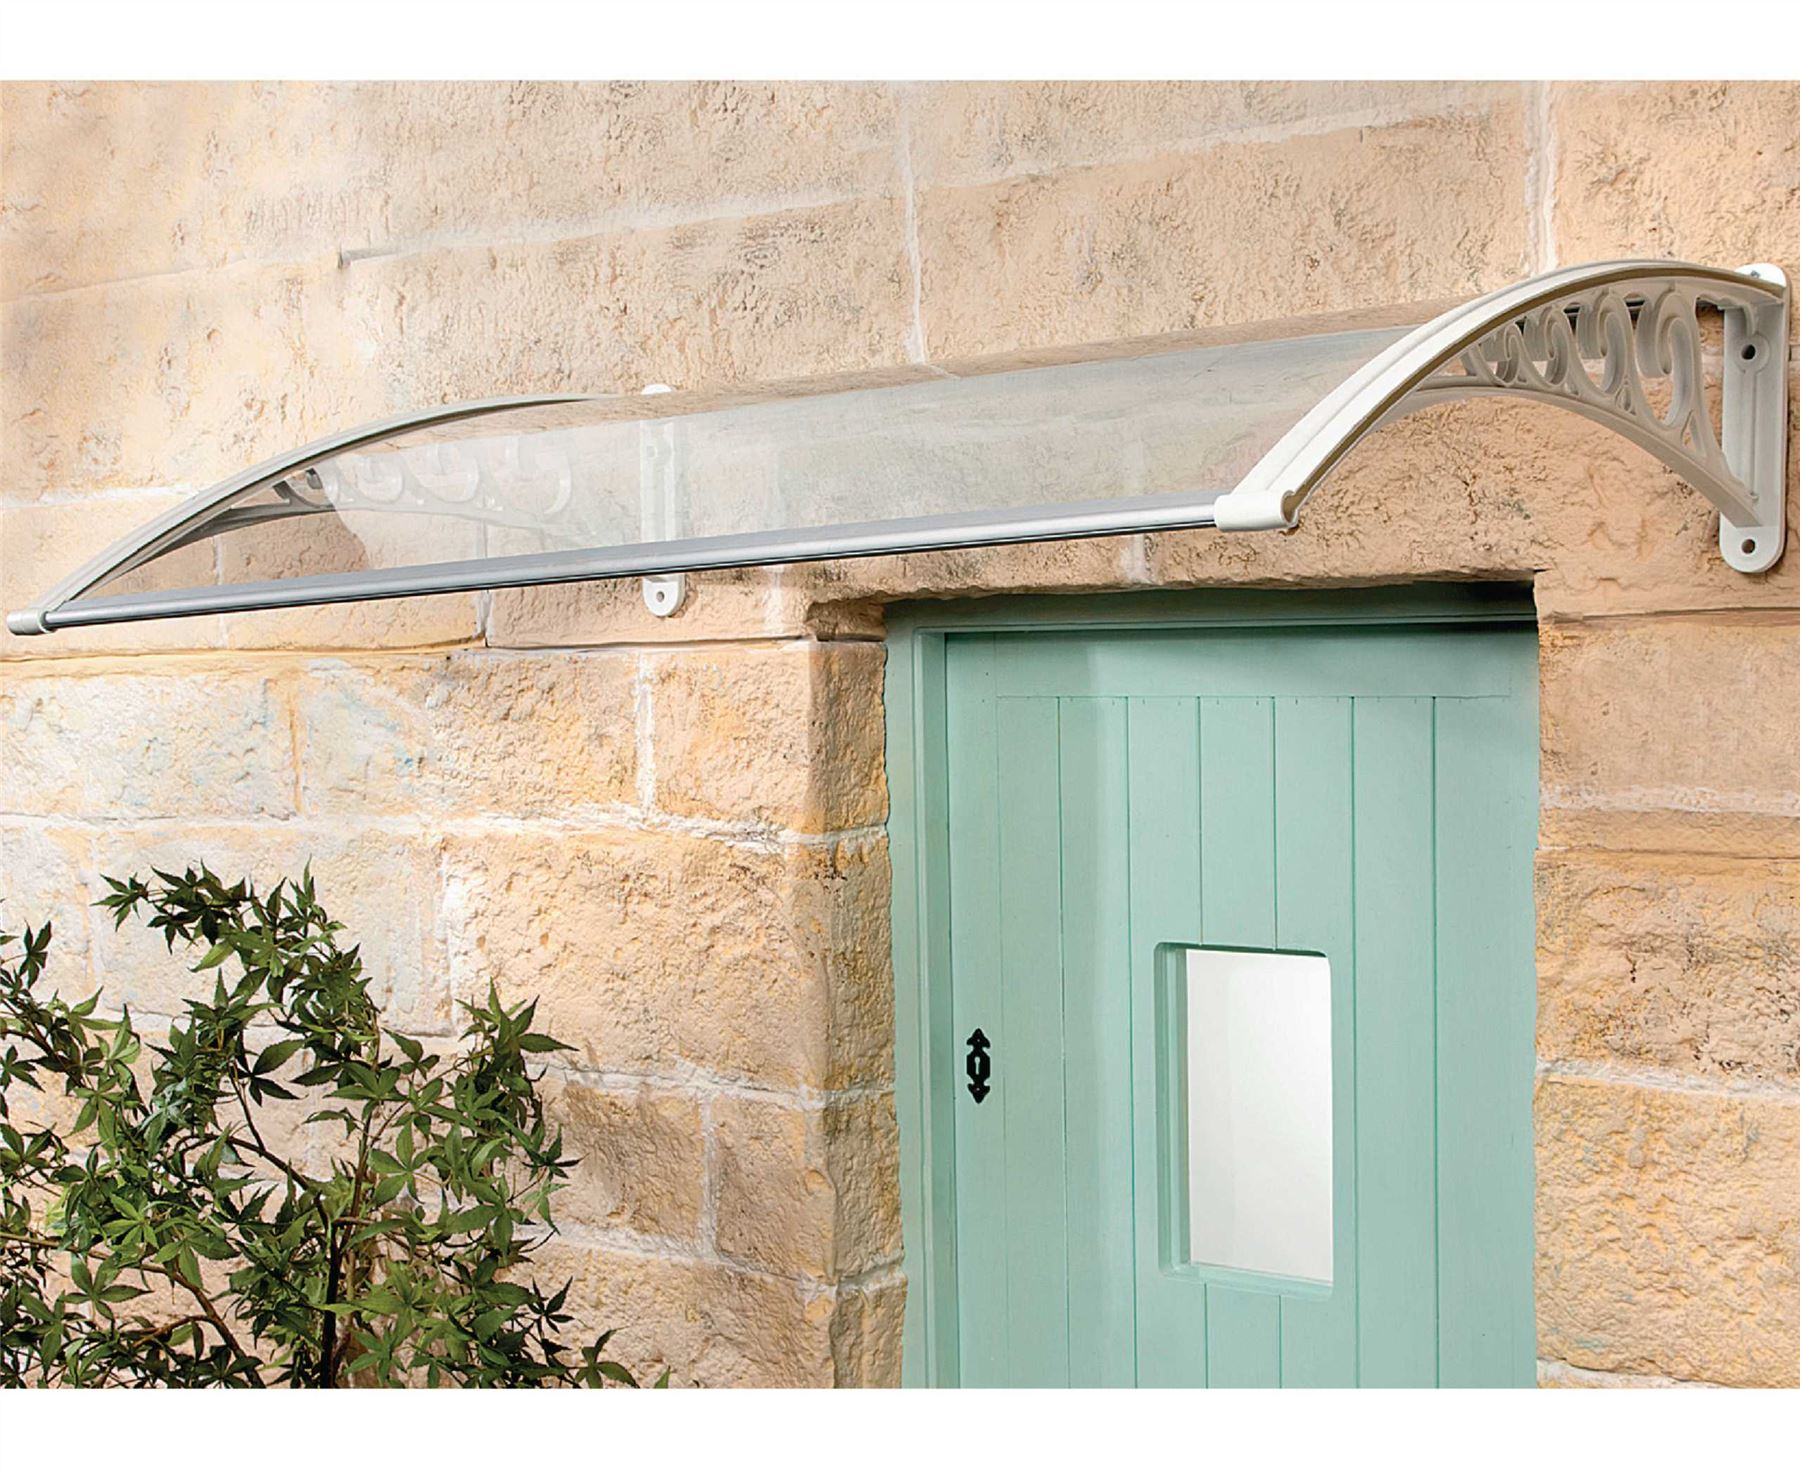 Bergman-Instant-Fit-Front-Door-Canopy-Rain-Cover- & Bergman Instant Fit Front Door Canopy Rain Cover Awning Porch Sun ...